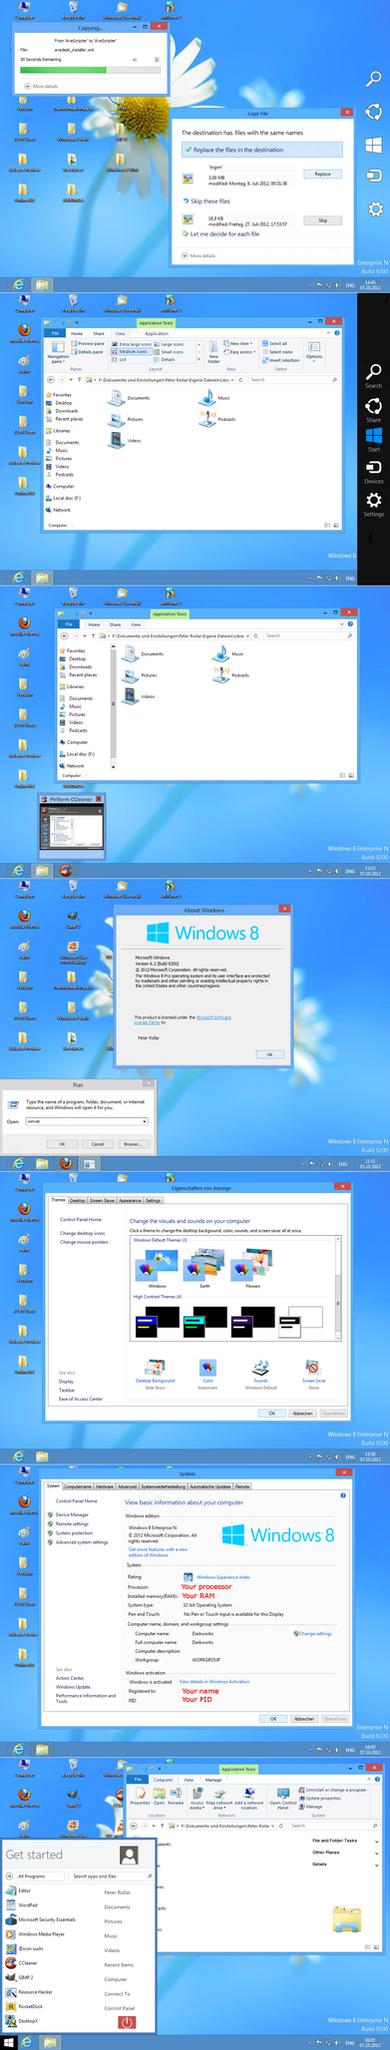 Windows 8 RTM Build 9200 by PeterRollar